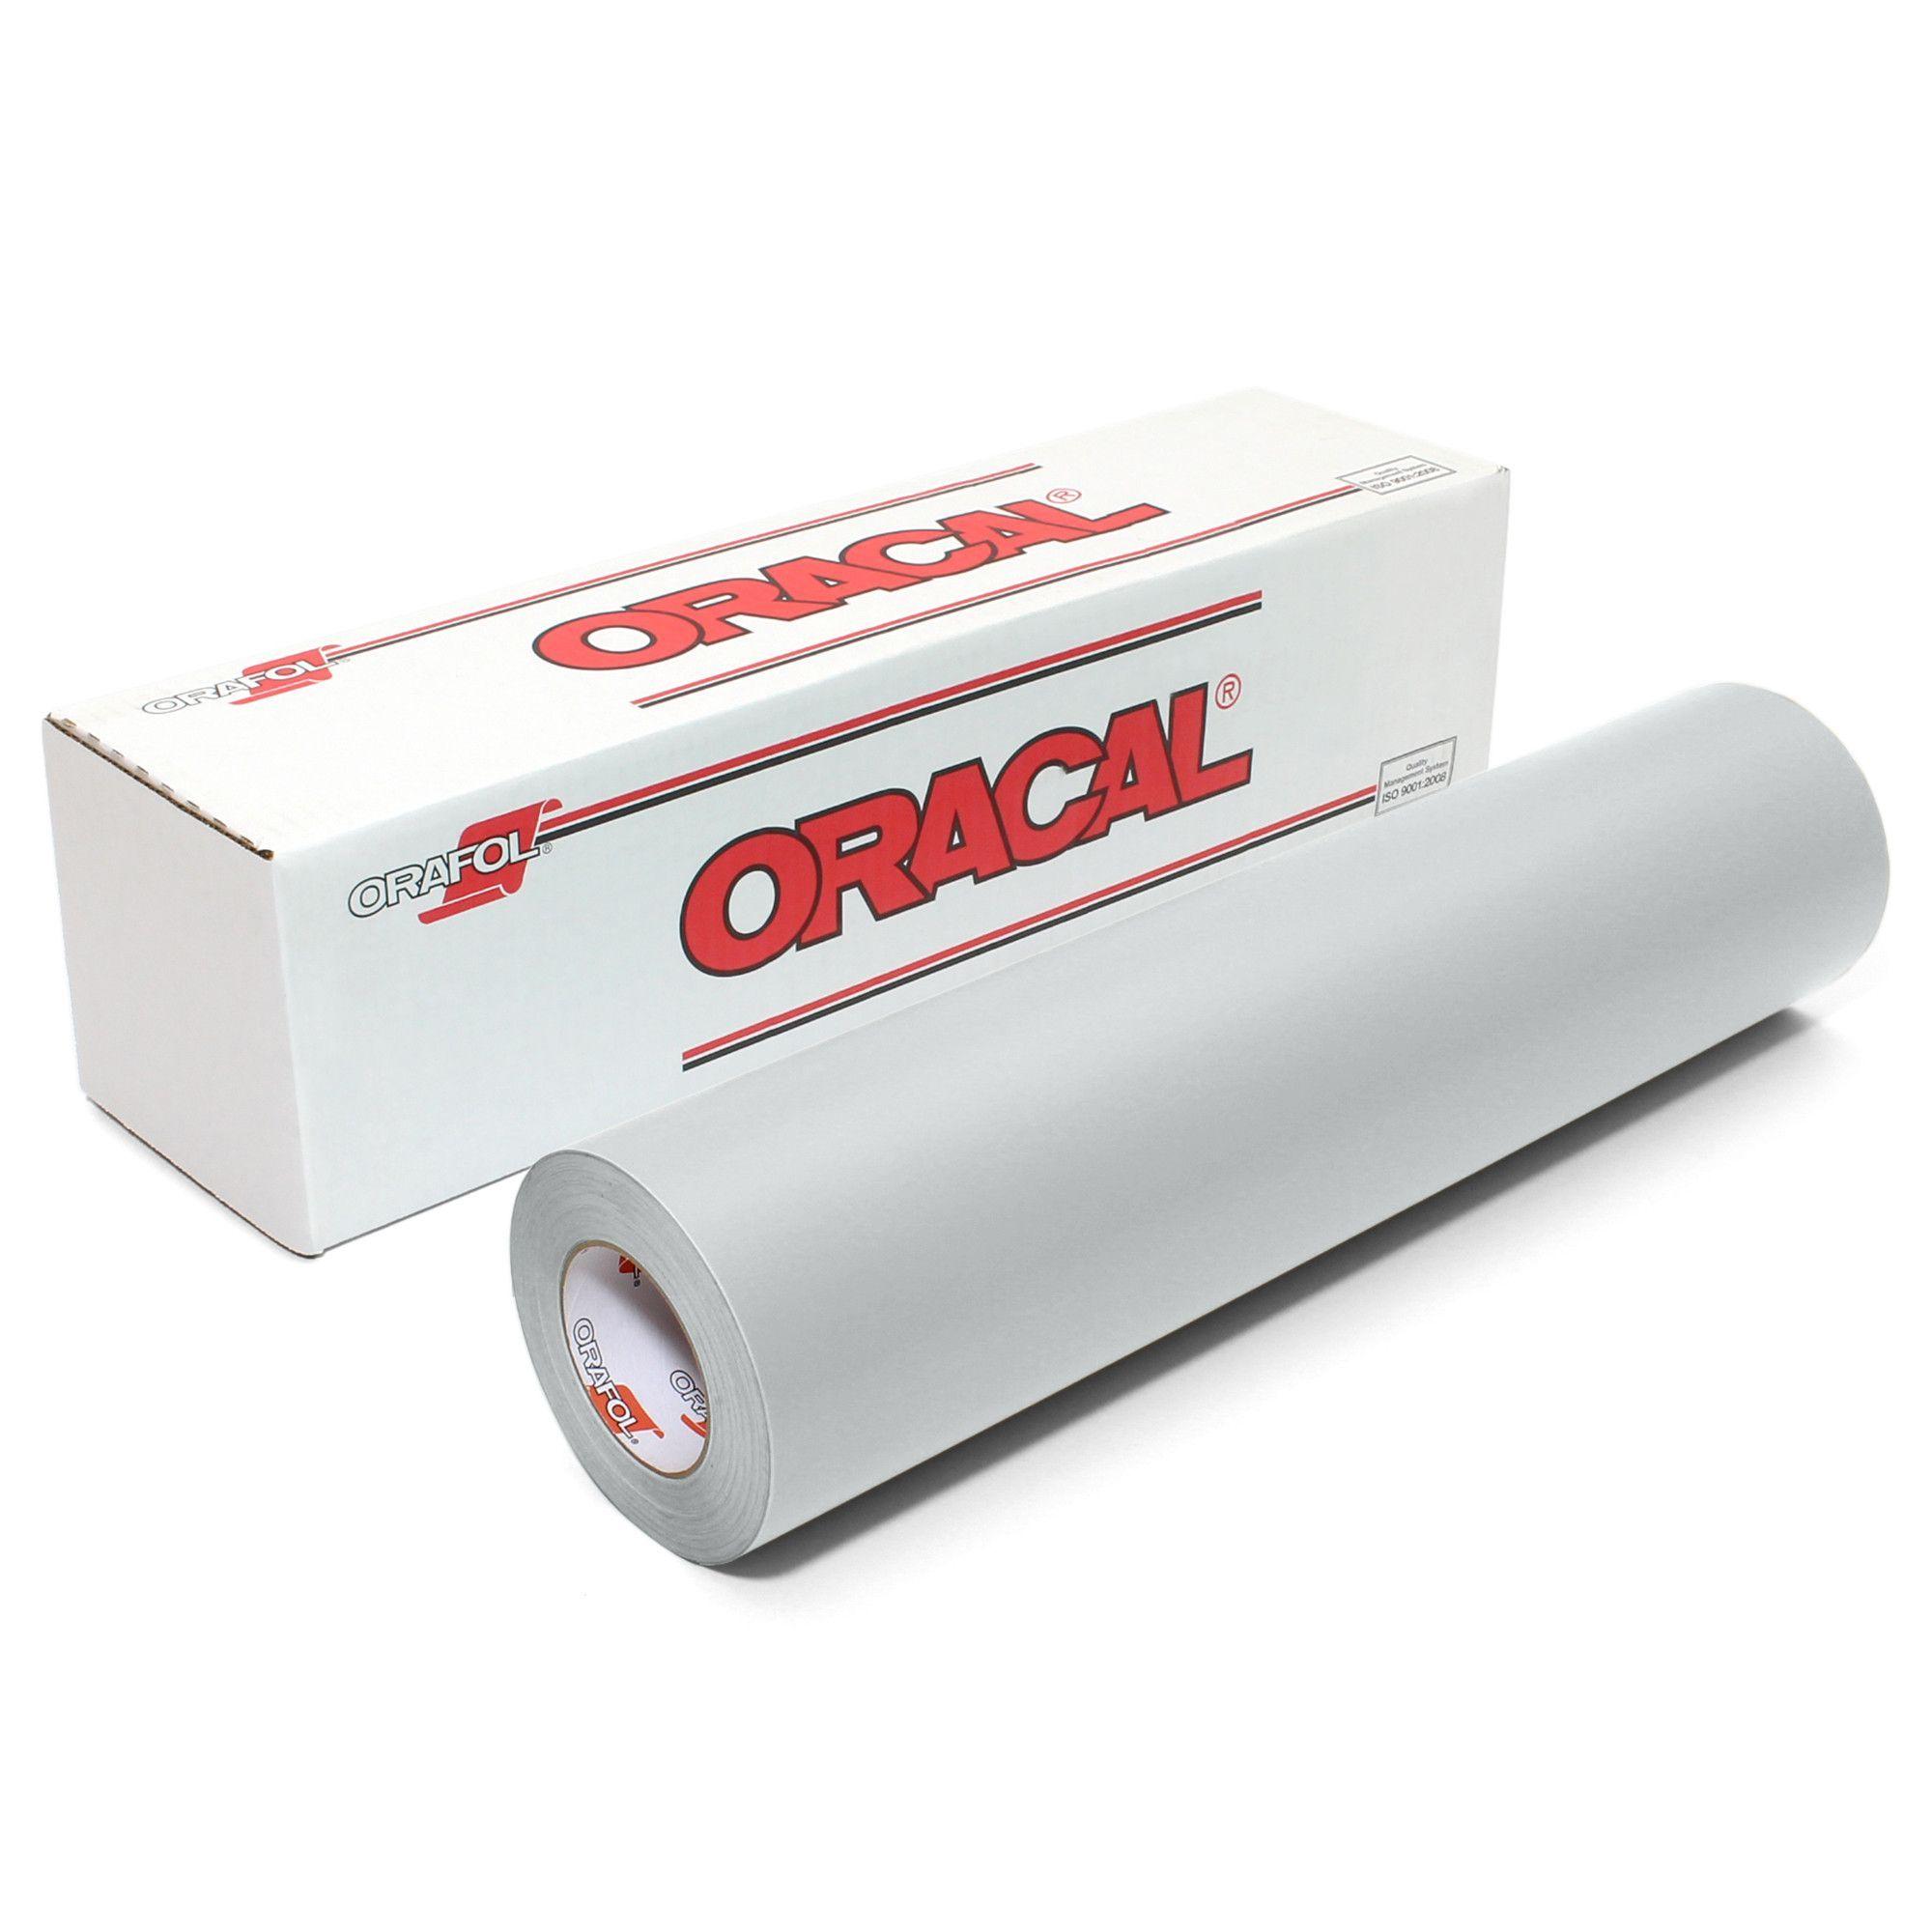 Oracal 631 Matte Vinyl Rolls Light Grey Vinyl Rolls Adhesive Vinyl Vinyl